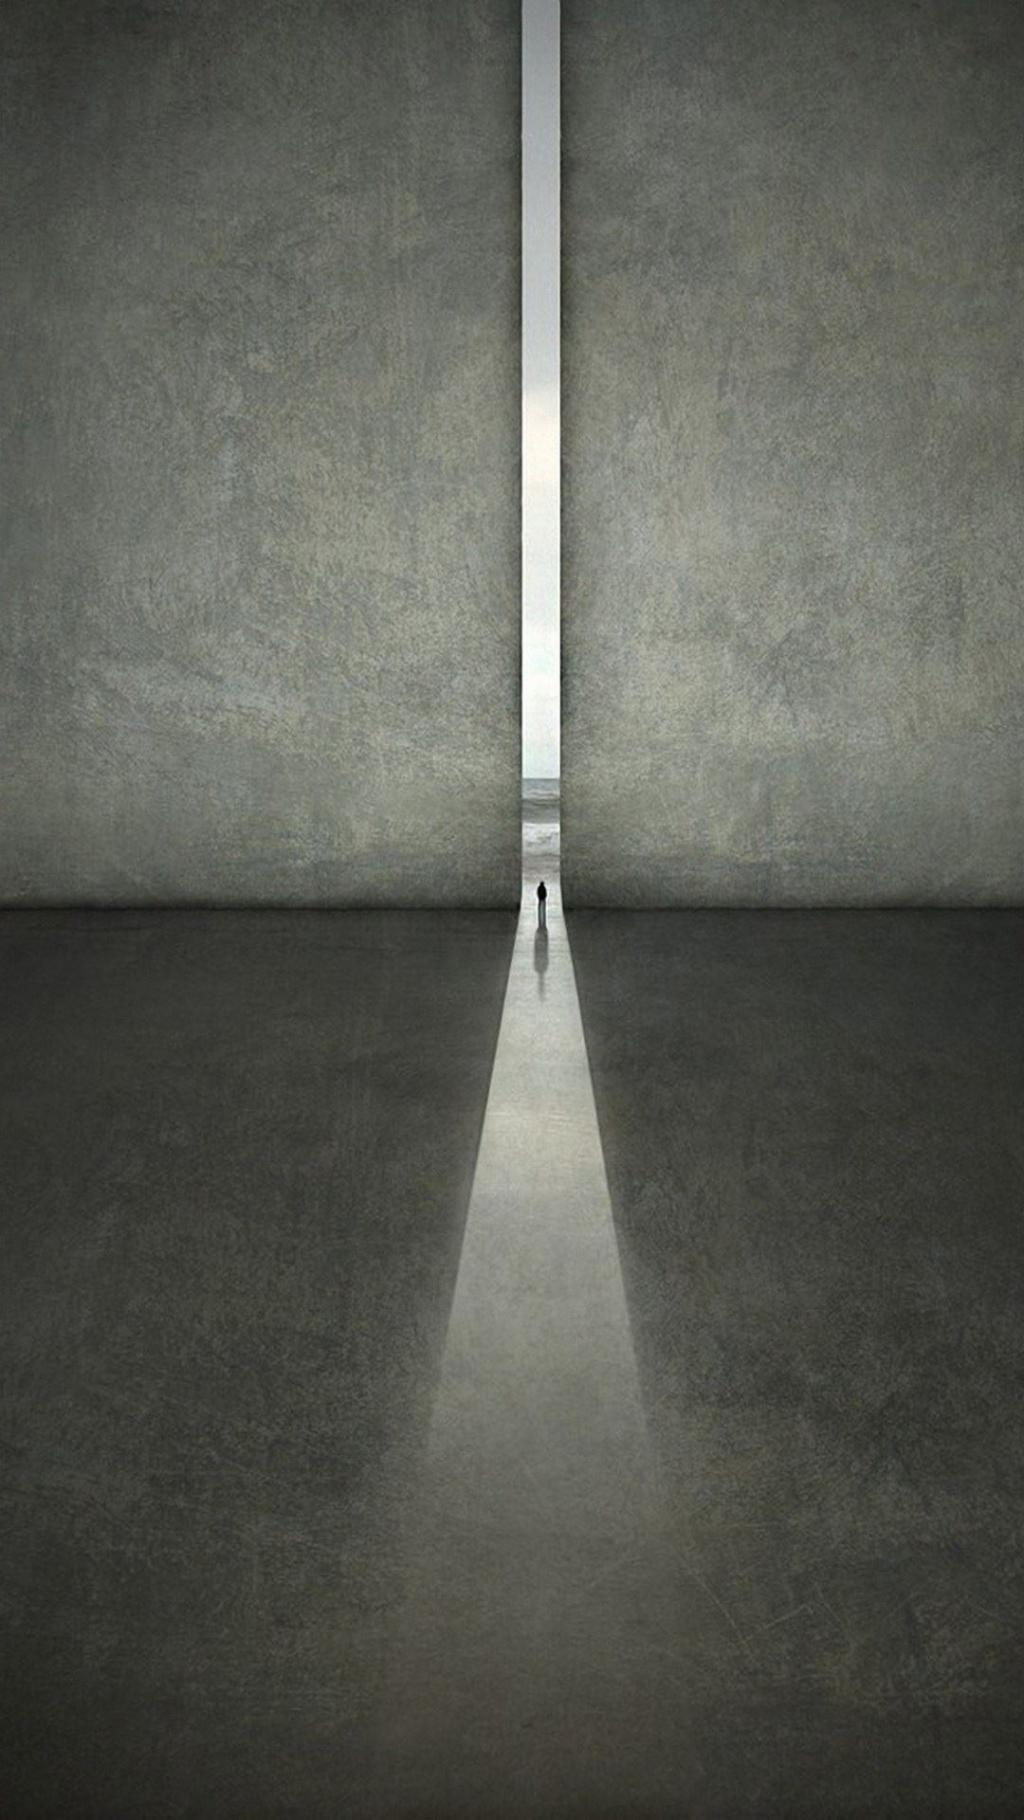 S4 Wallpaper Hd 灰色的墙 锁屏图片 高清手机壁纸 另类 回车桌面